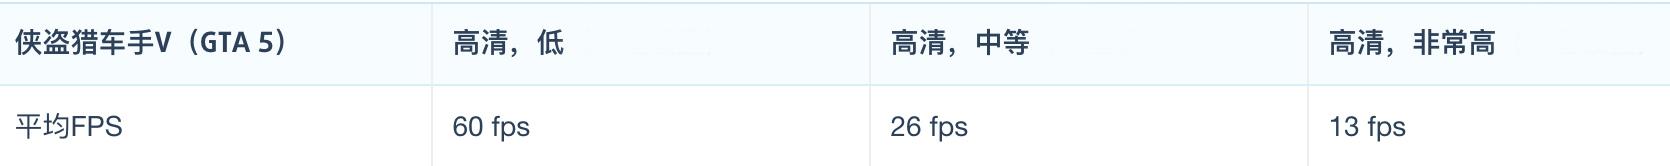 Dell 戴尔 Inspiron 灵越 17(5770)评测